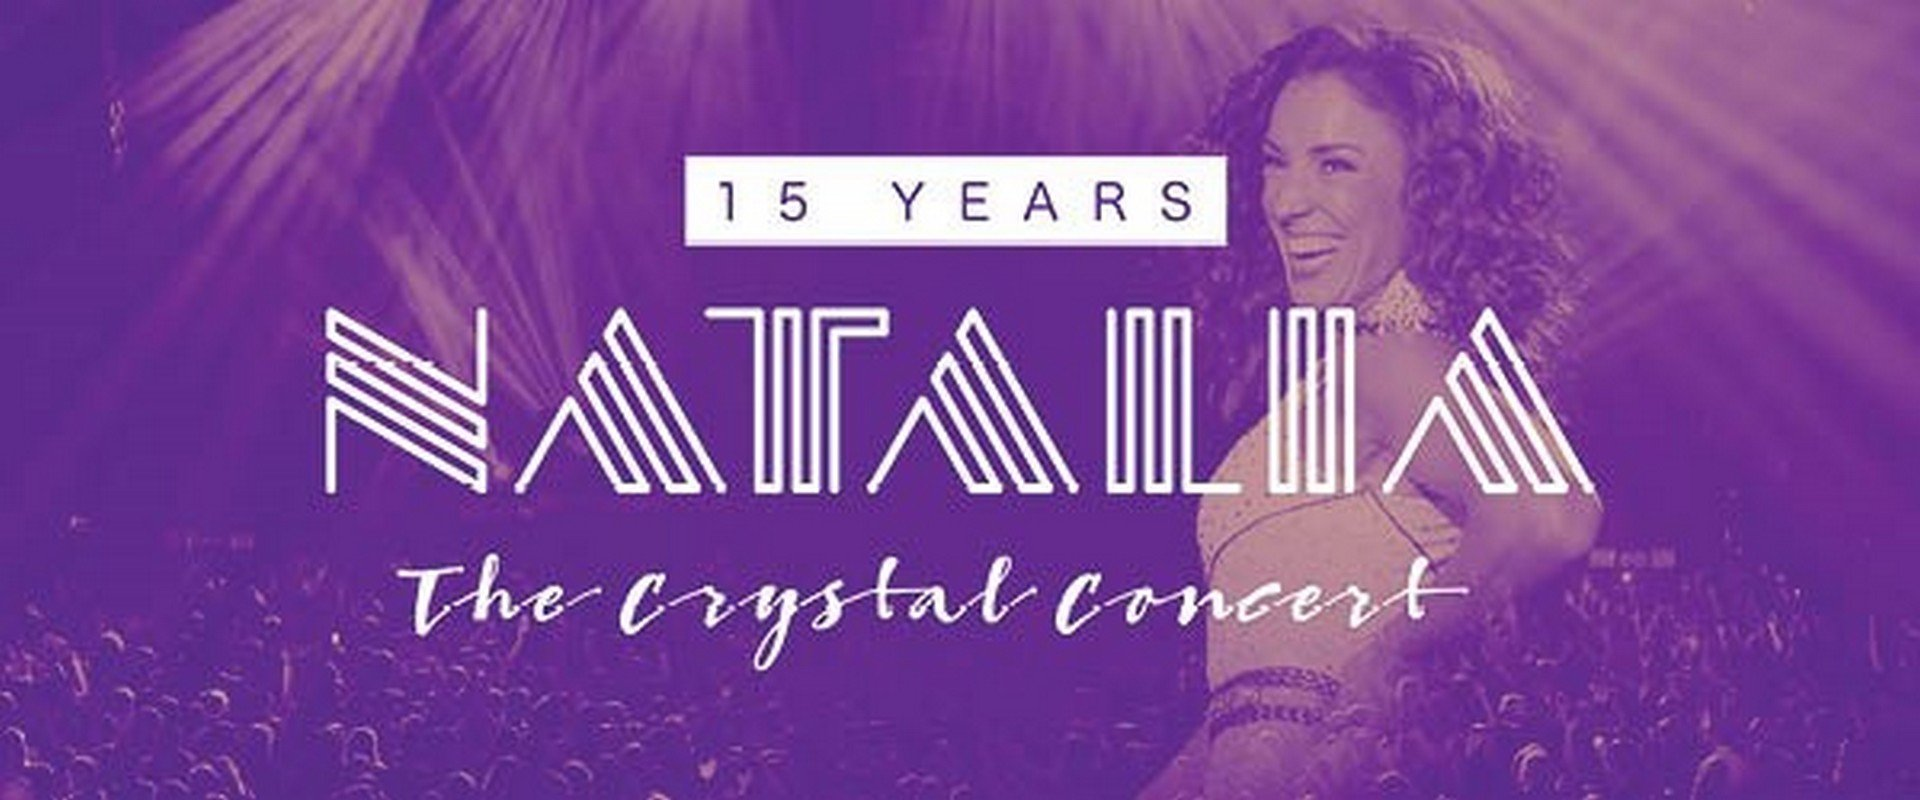 EXTRA 15 YEARS NATALIA THE CRYSTAL CONCERT - Nathalia 15 Years logo